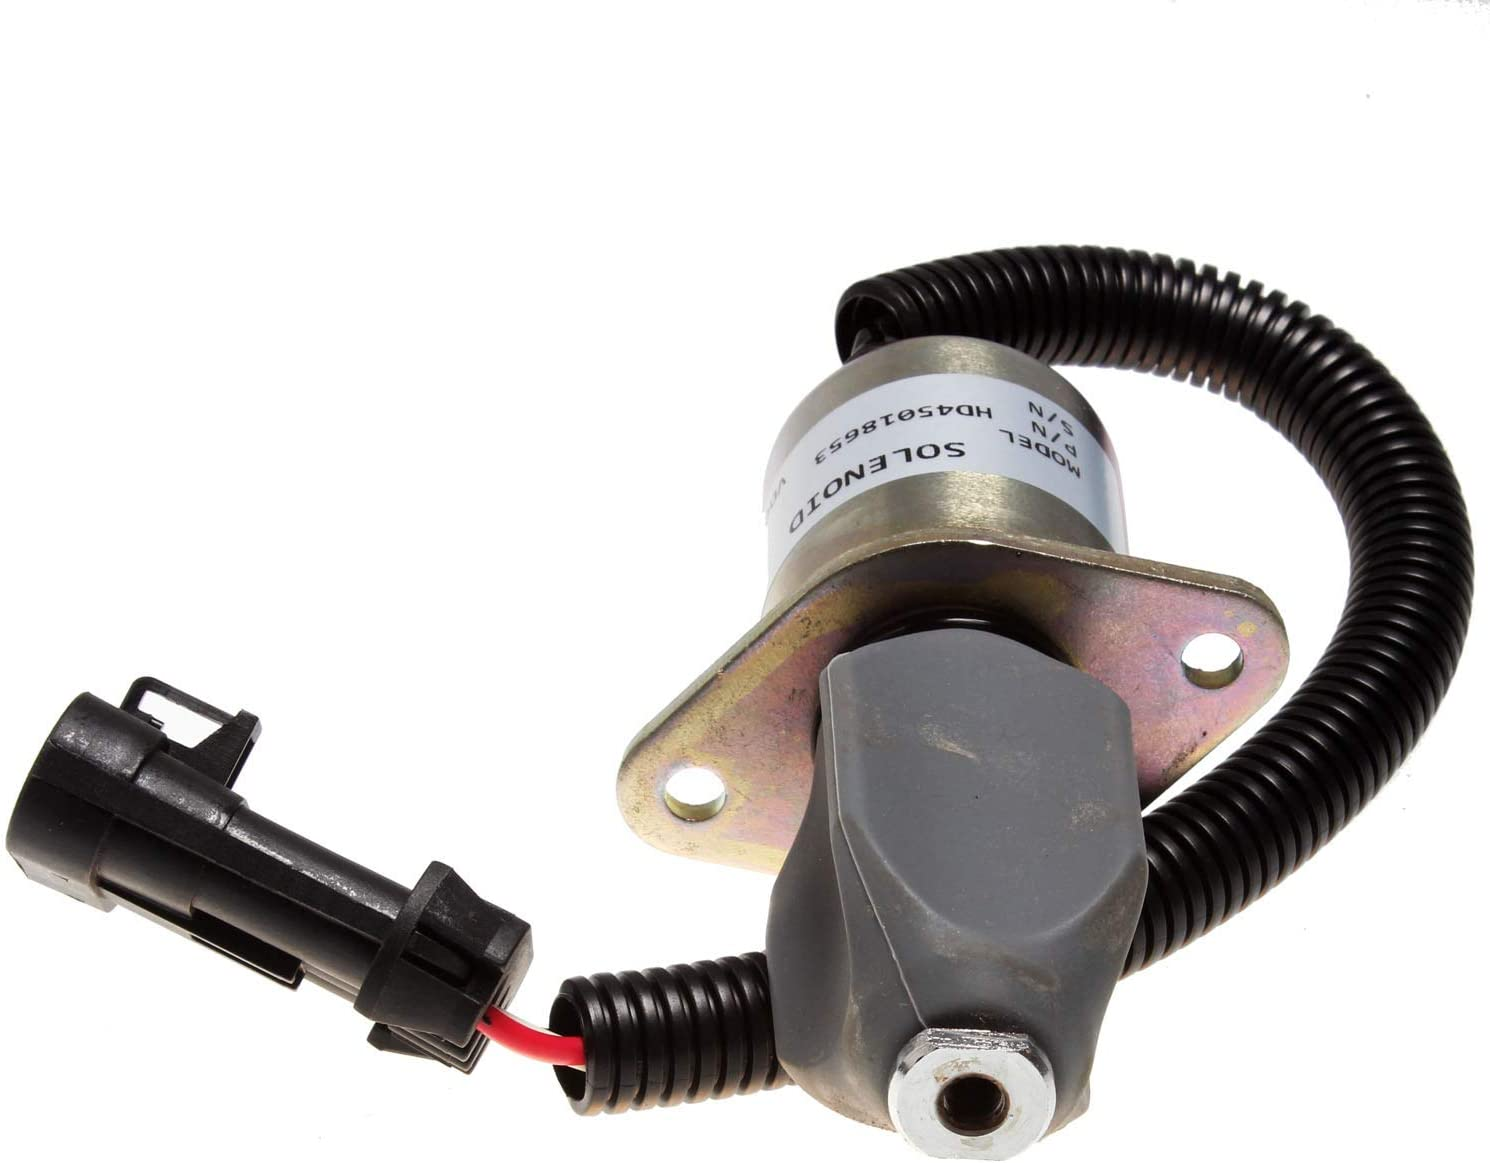 Mover Parts 12V Fuel ShutOff Solenoid 6681513 for Bobcat Skid Steer 751 753 763 773 7753 325 328 331 334 337 341 5600 S150 S160 S175 S185 T190